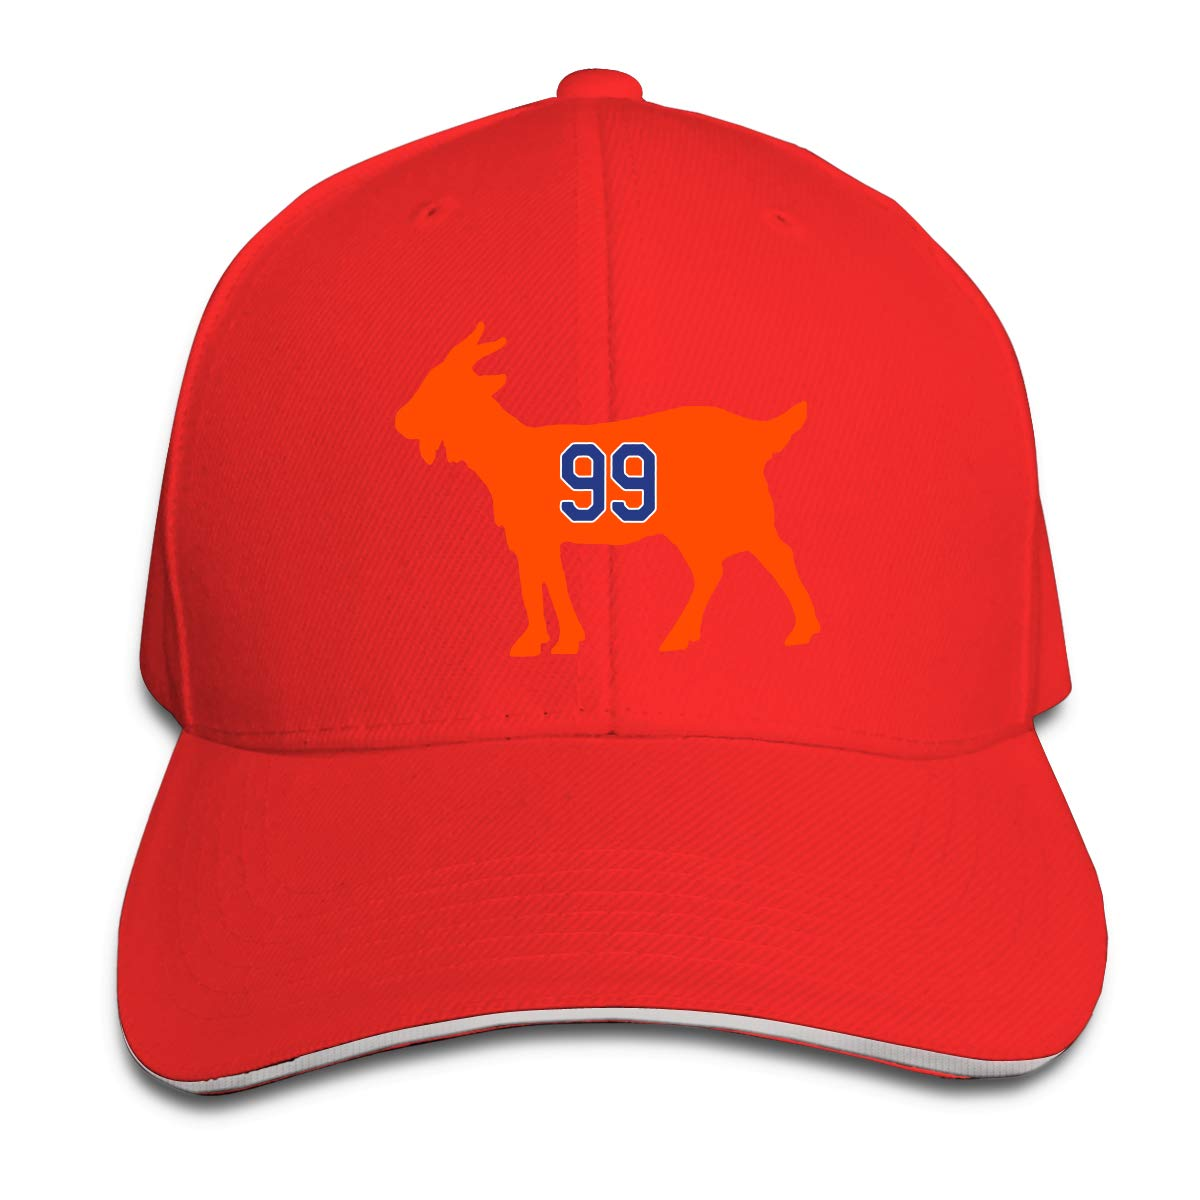 Moore Me Adjustable Baseball Cap Edmonton Gretzky Goat Cool Snapback Hats